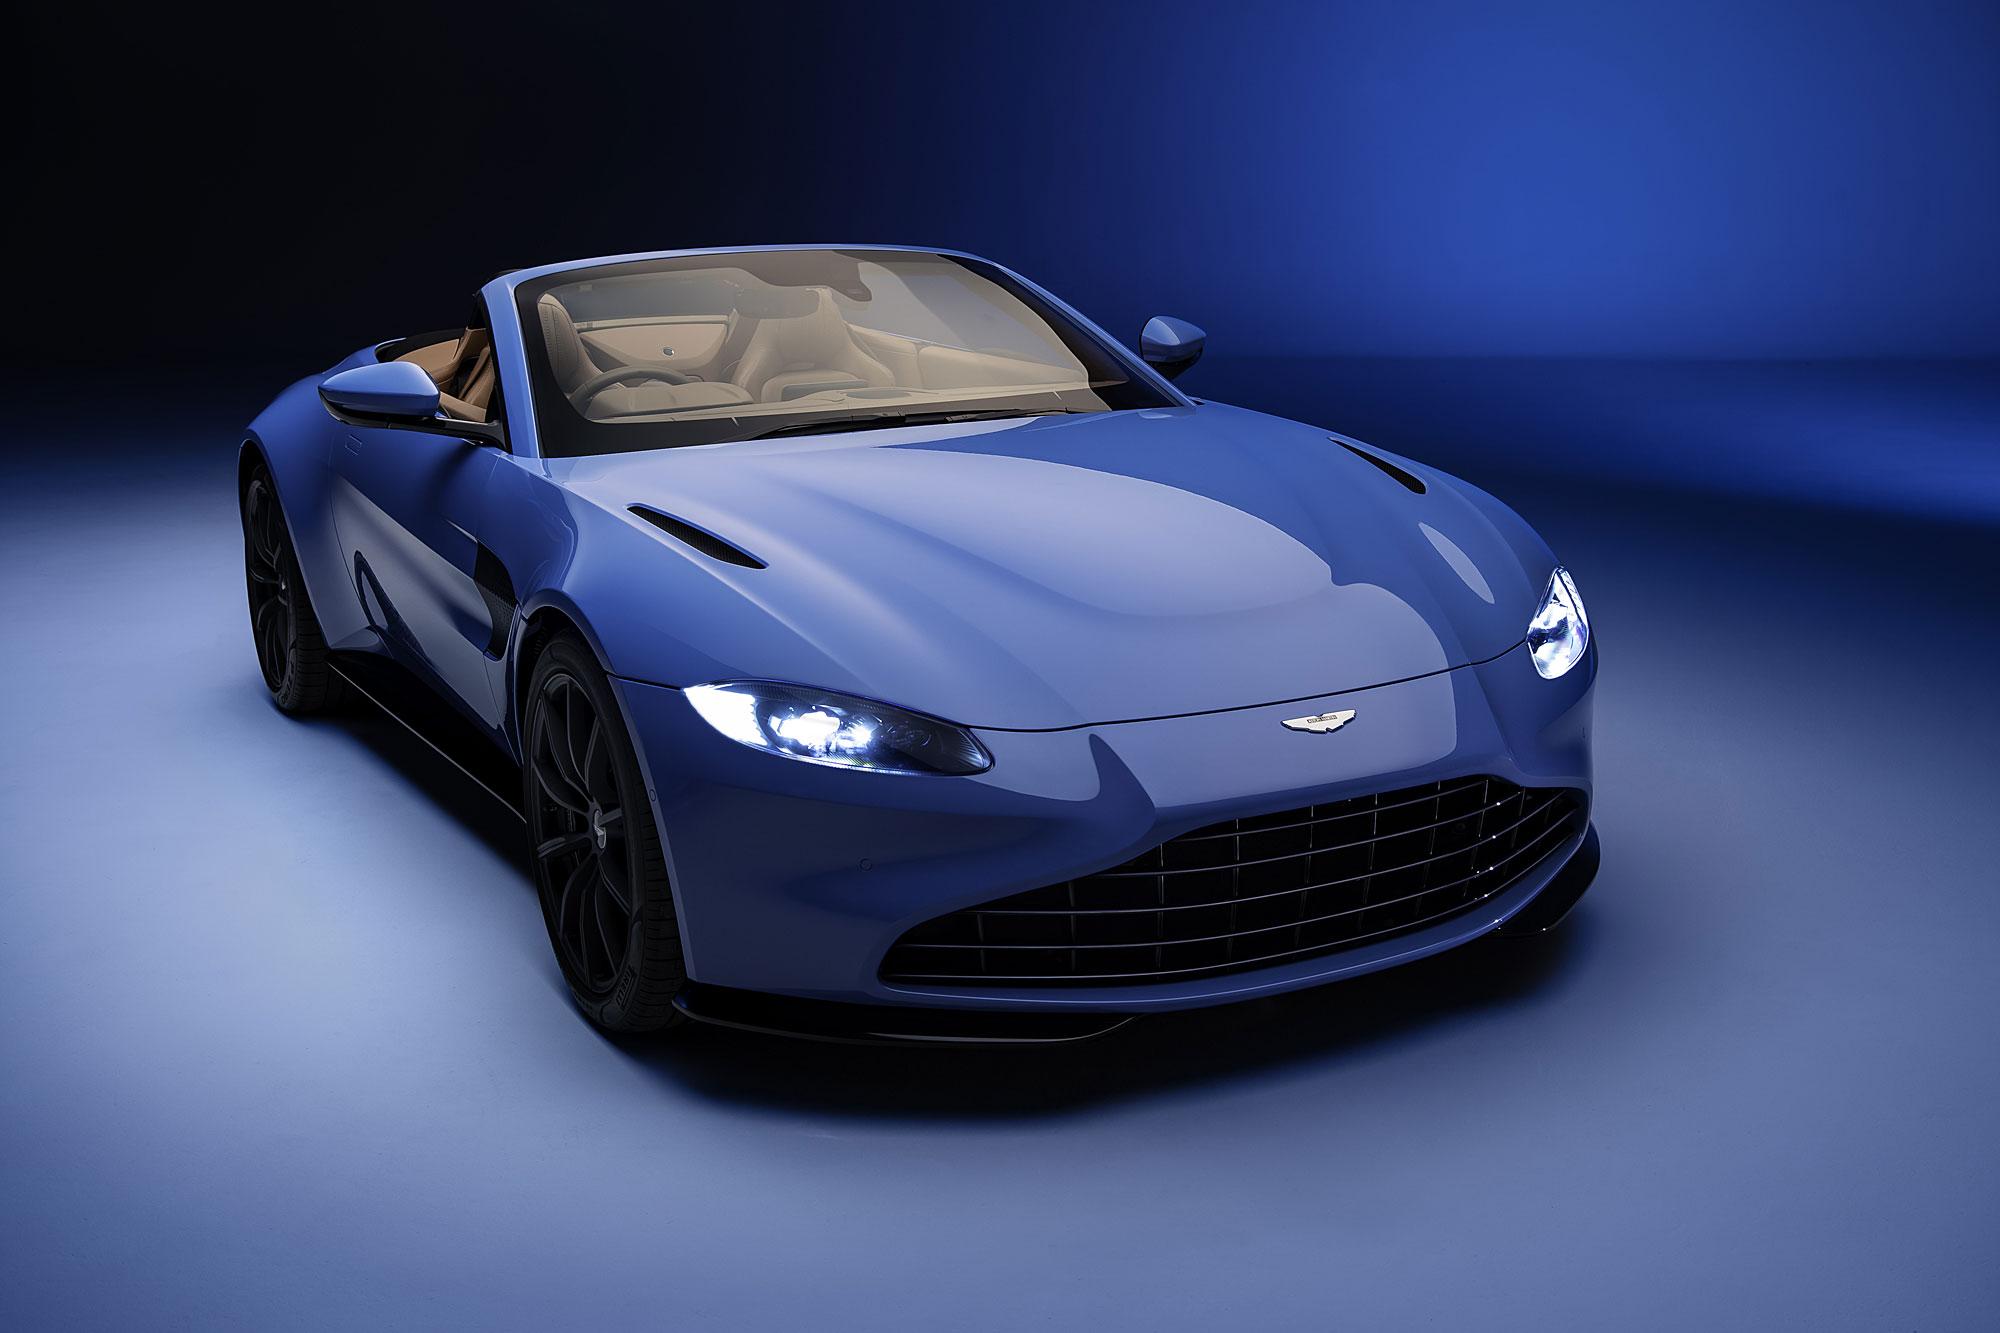 Aston Martin Vantage Roadster 預告 2020 日內瓦車展現身。